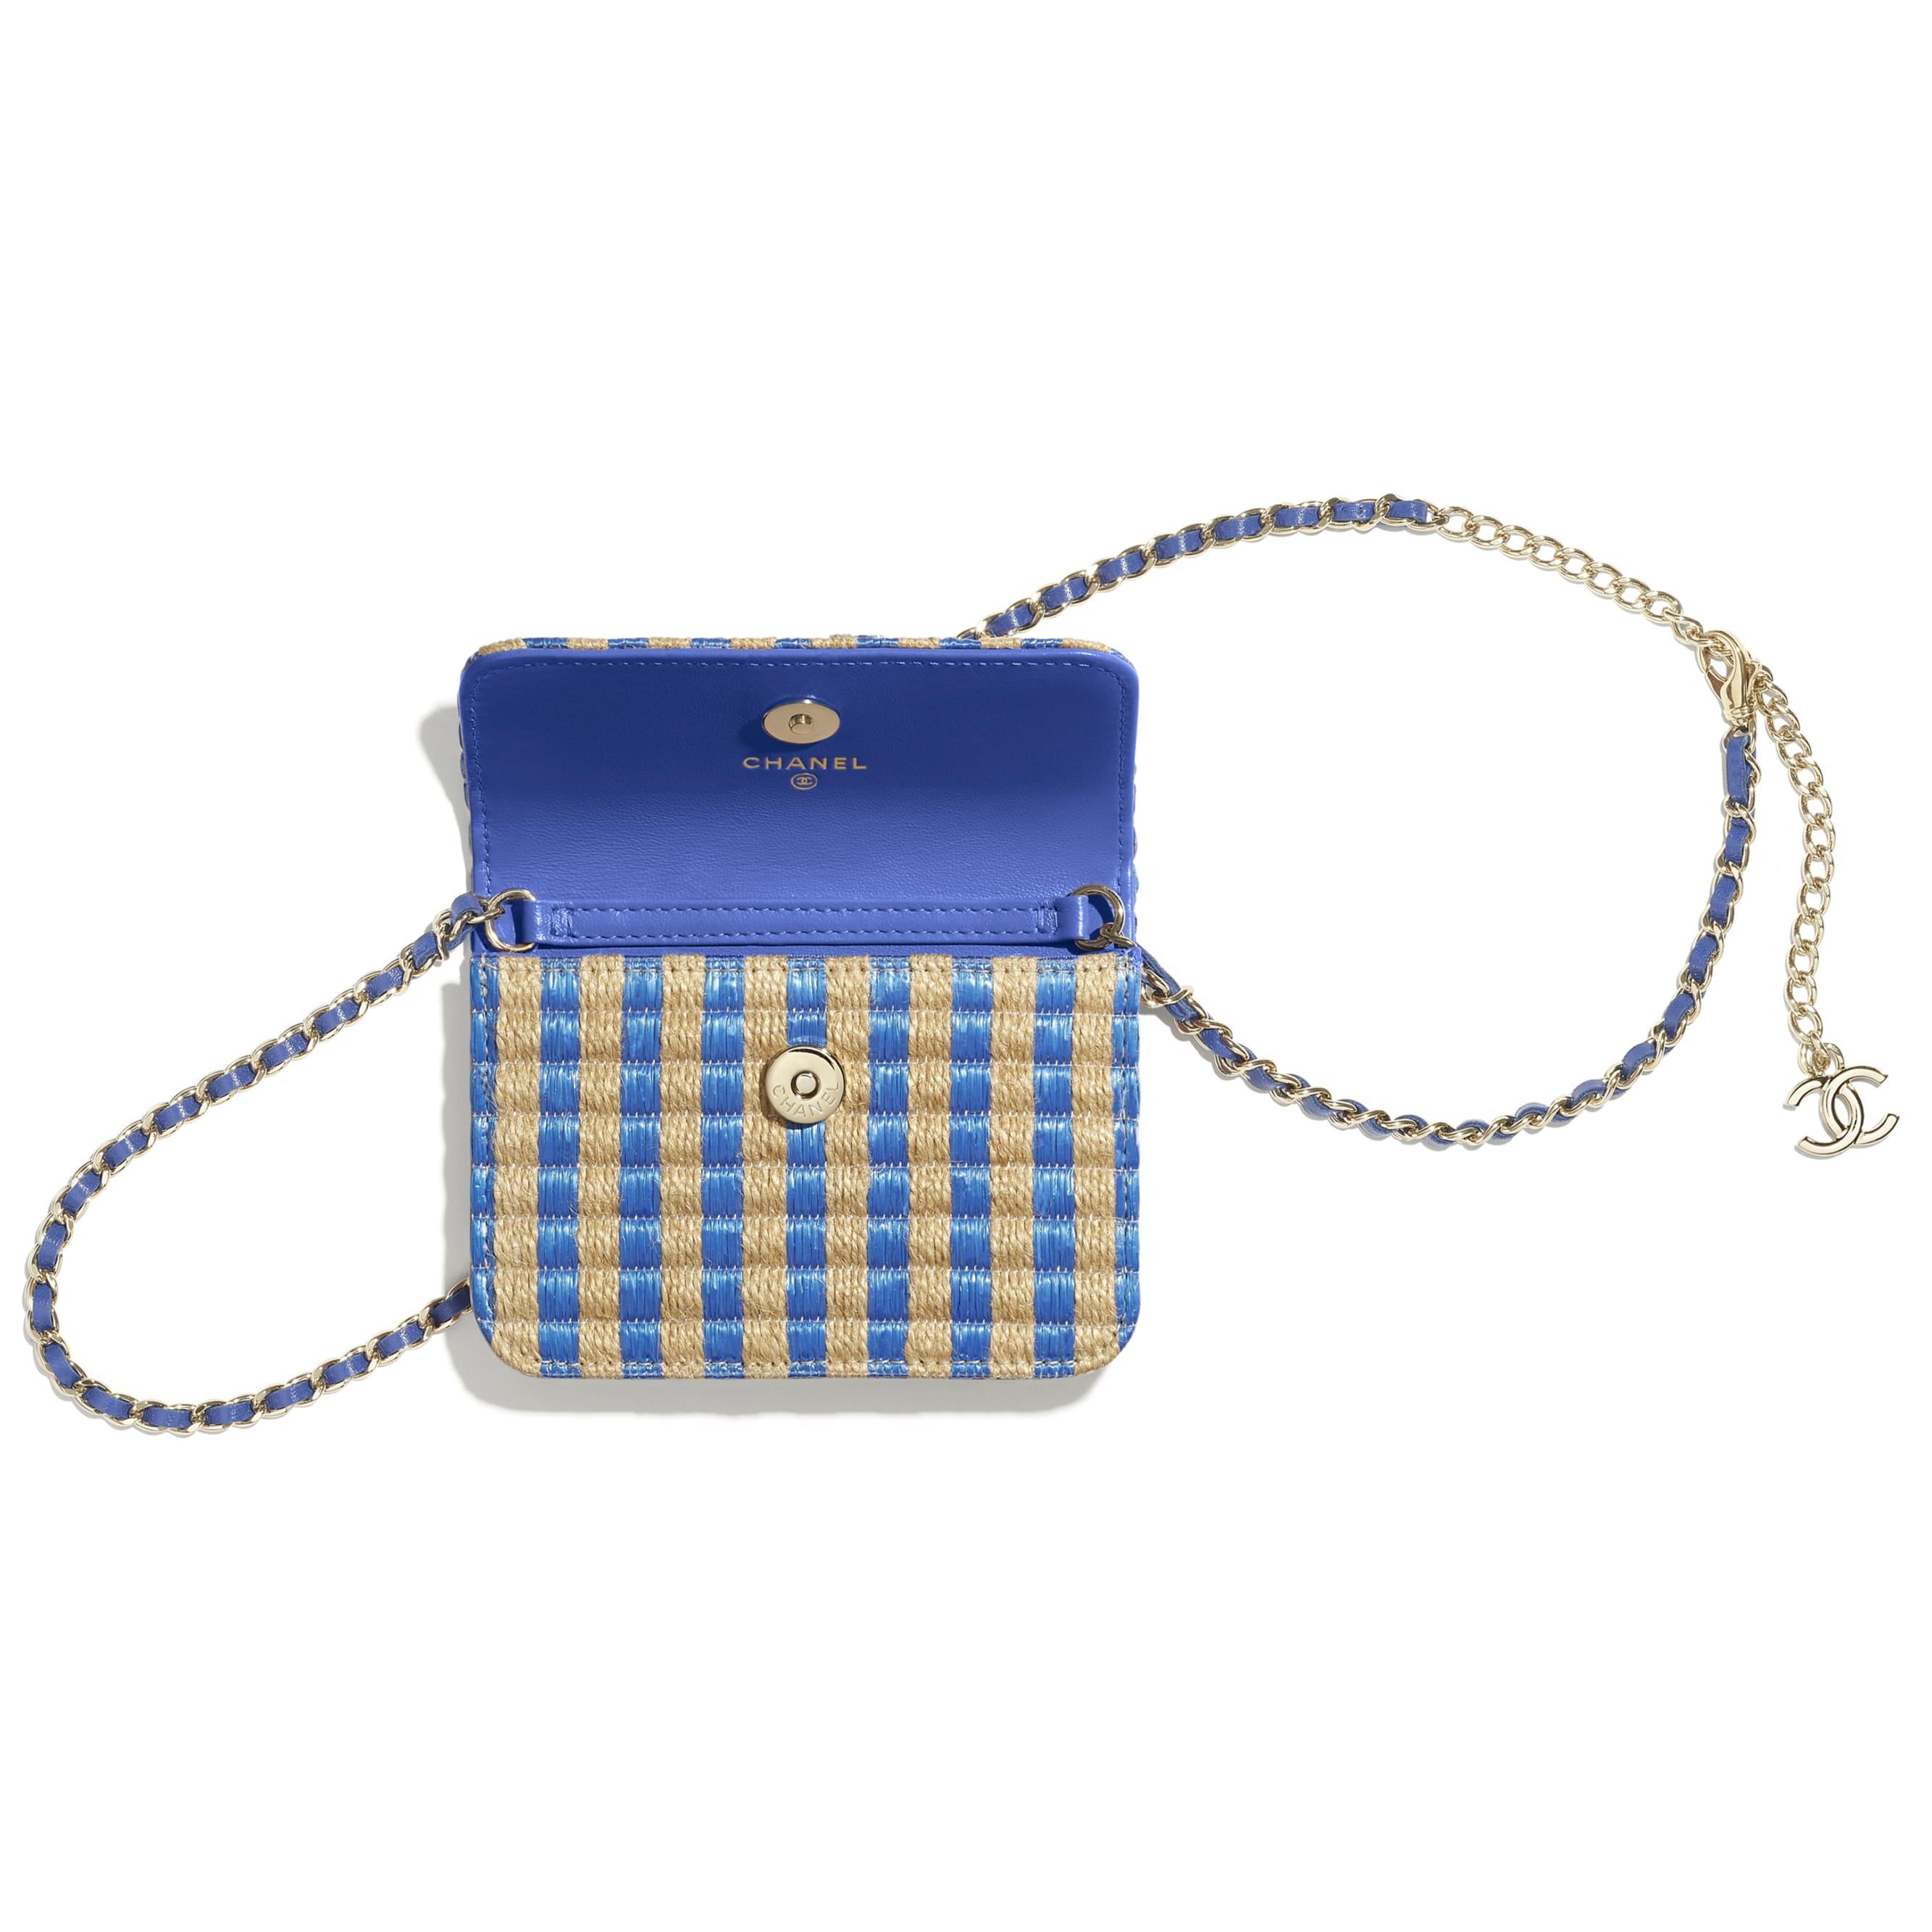 Belt Bag - Blue & Beige - Raffia, Jute Thread & Gold-Tone Metal - CHANEL - Alternative view - see standard sized version